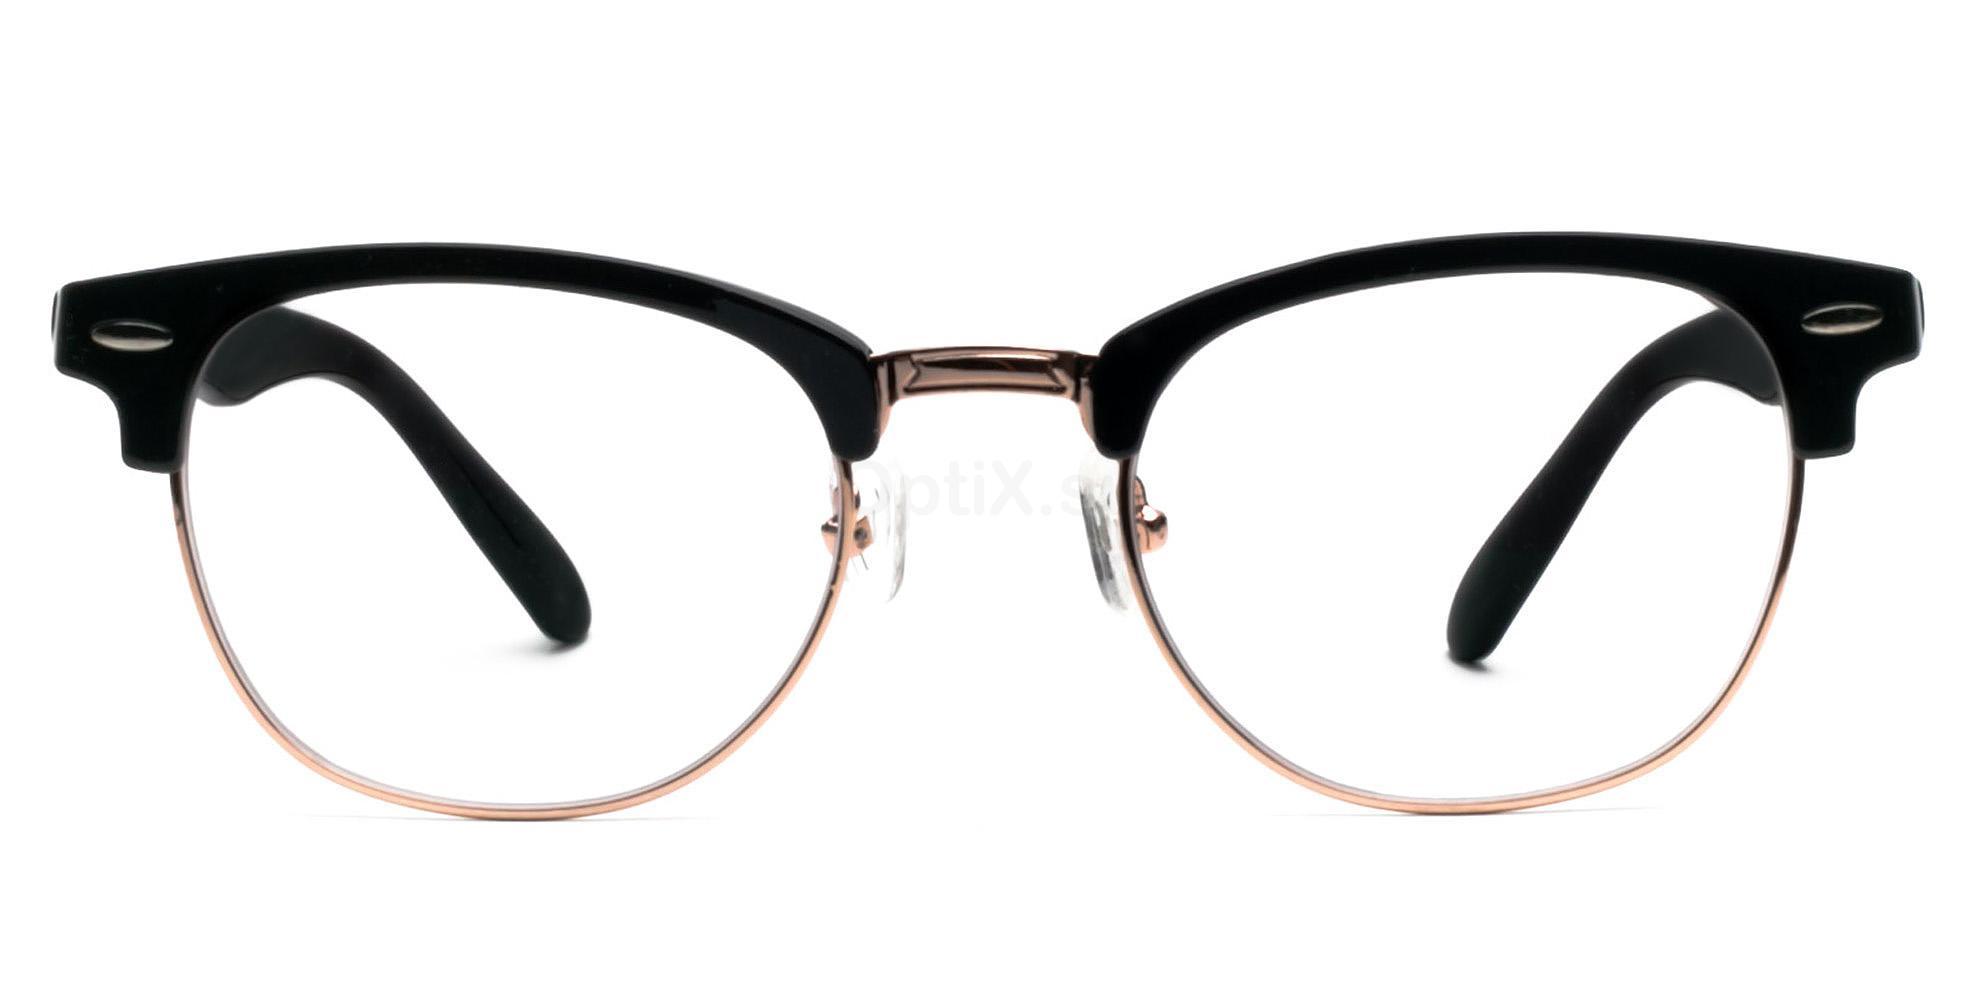 COL1 F3026 Glasses, Infinity